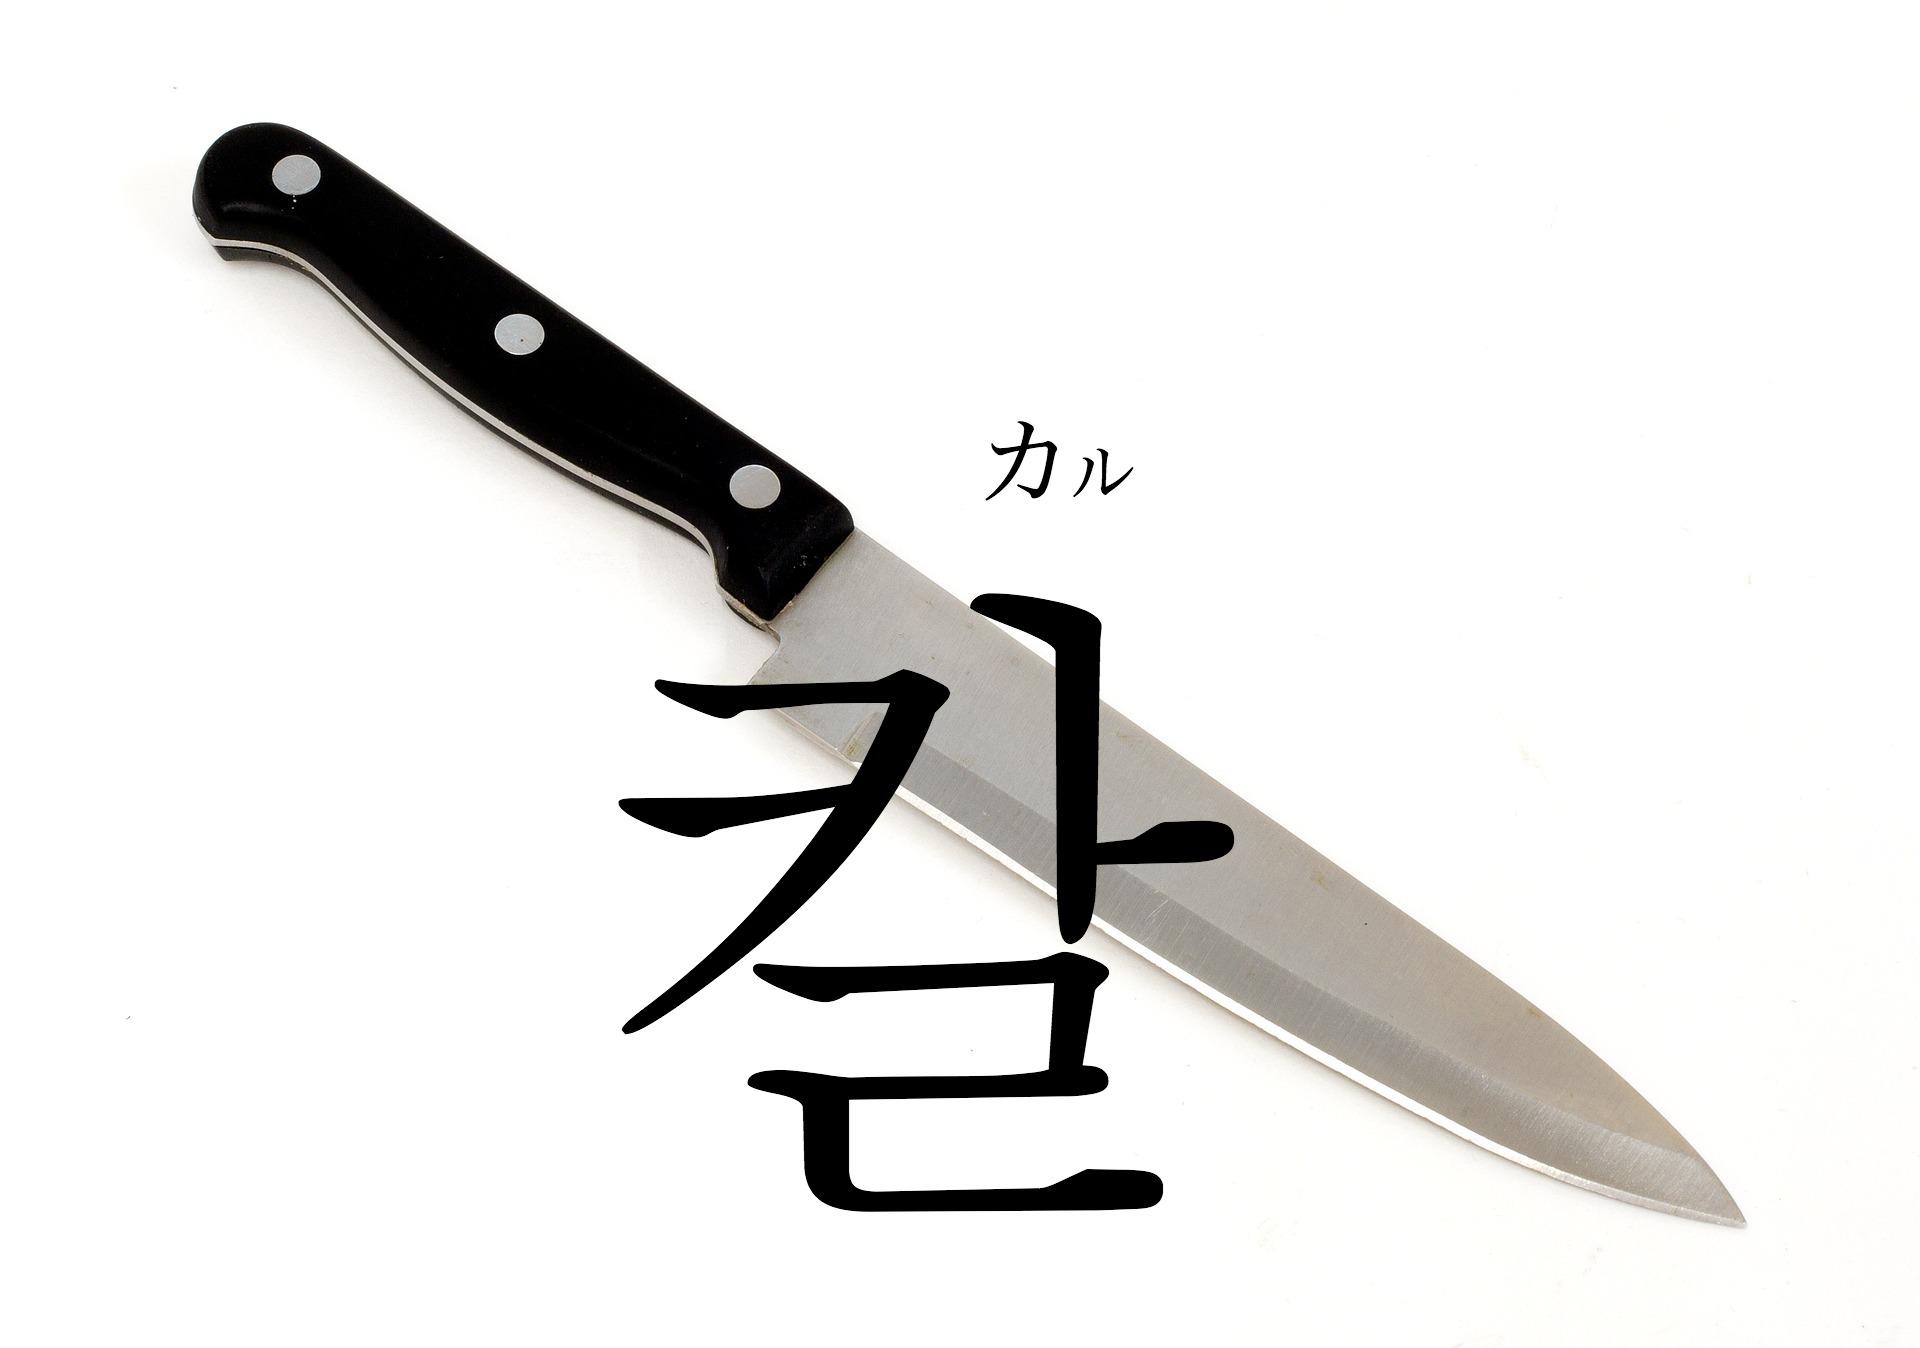 koreanword-knife